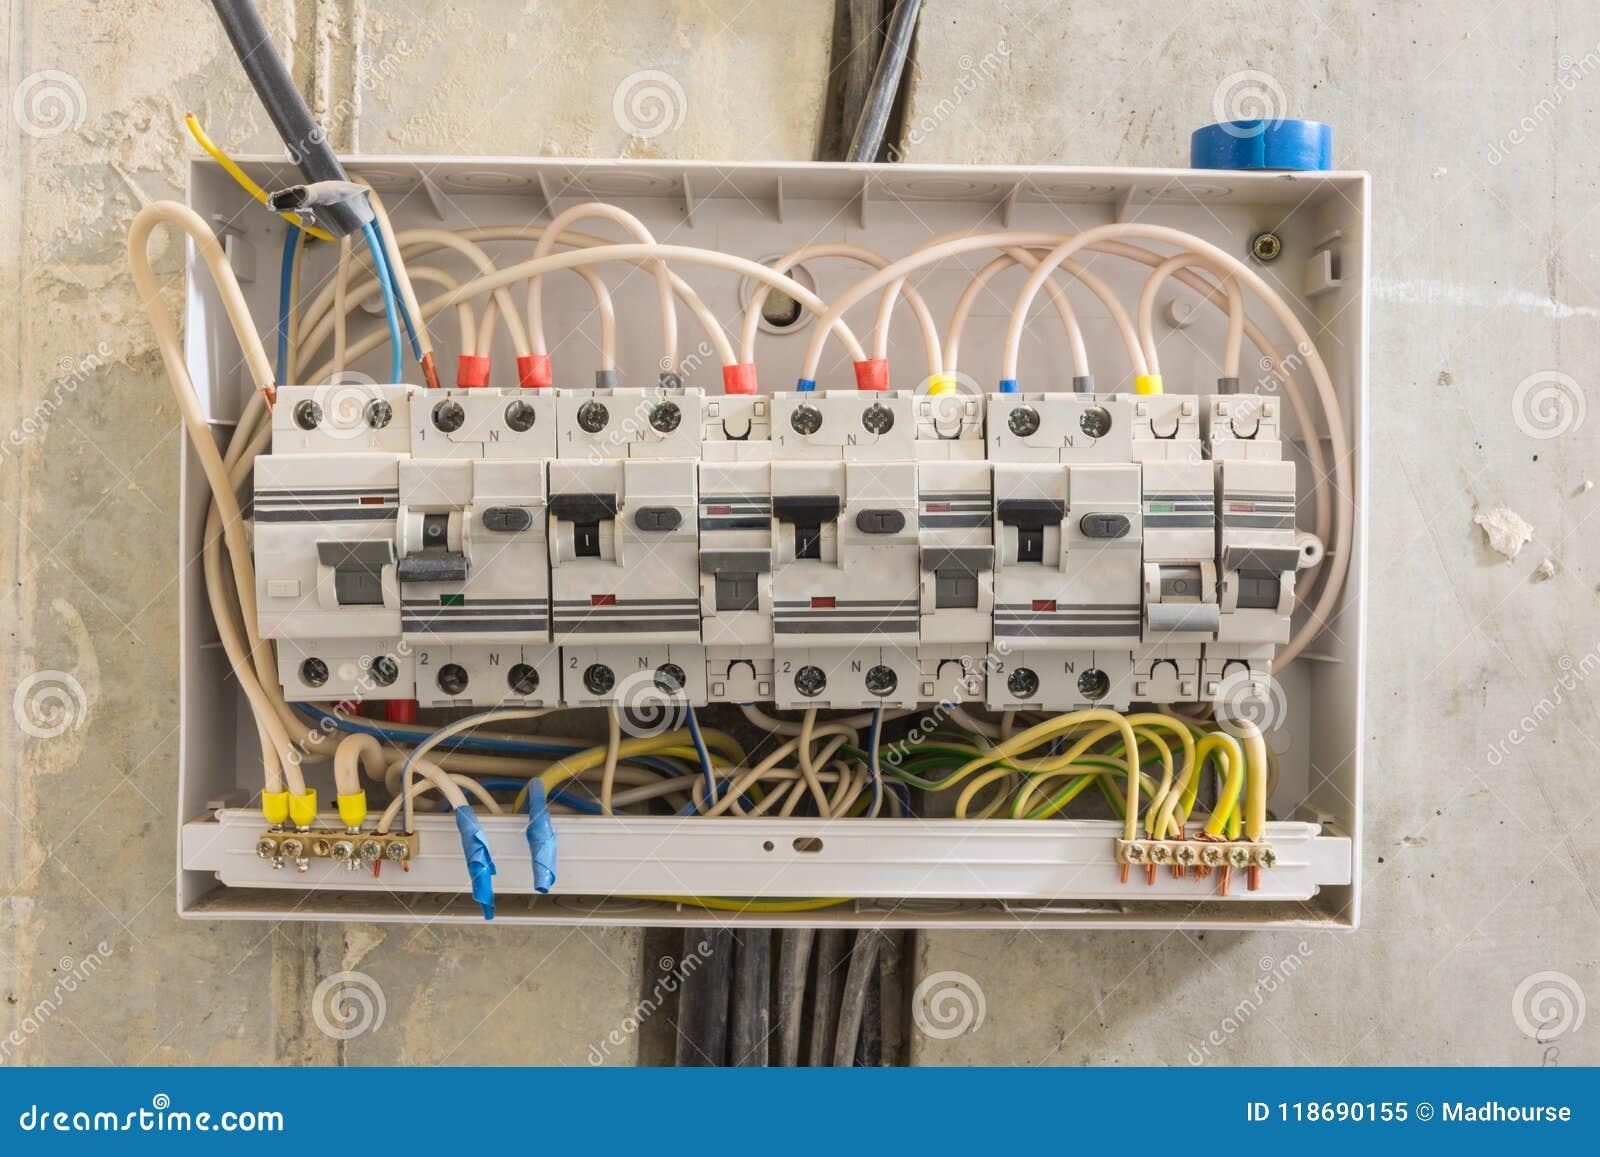 Electronic Shutdown Circuit